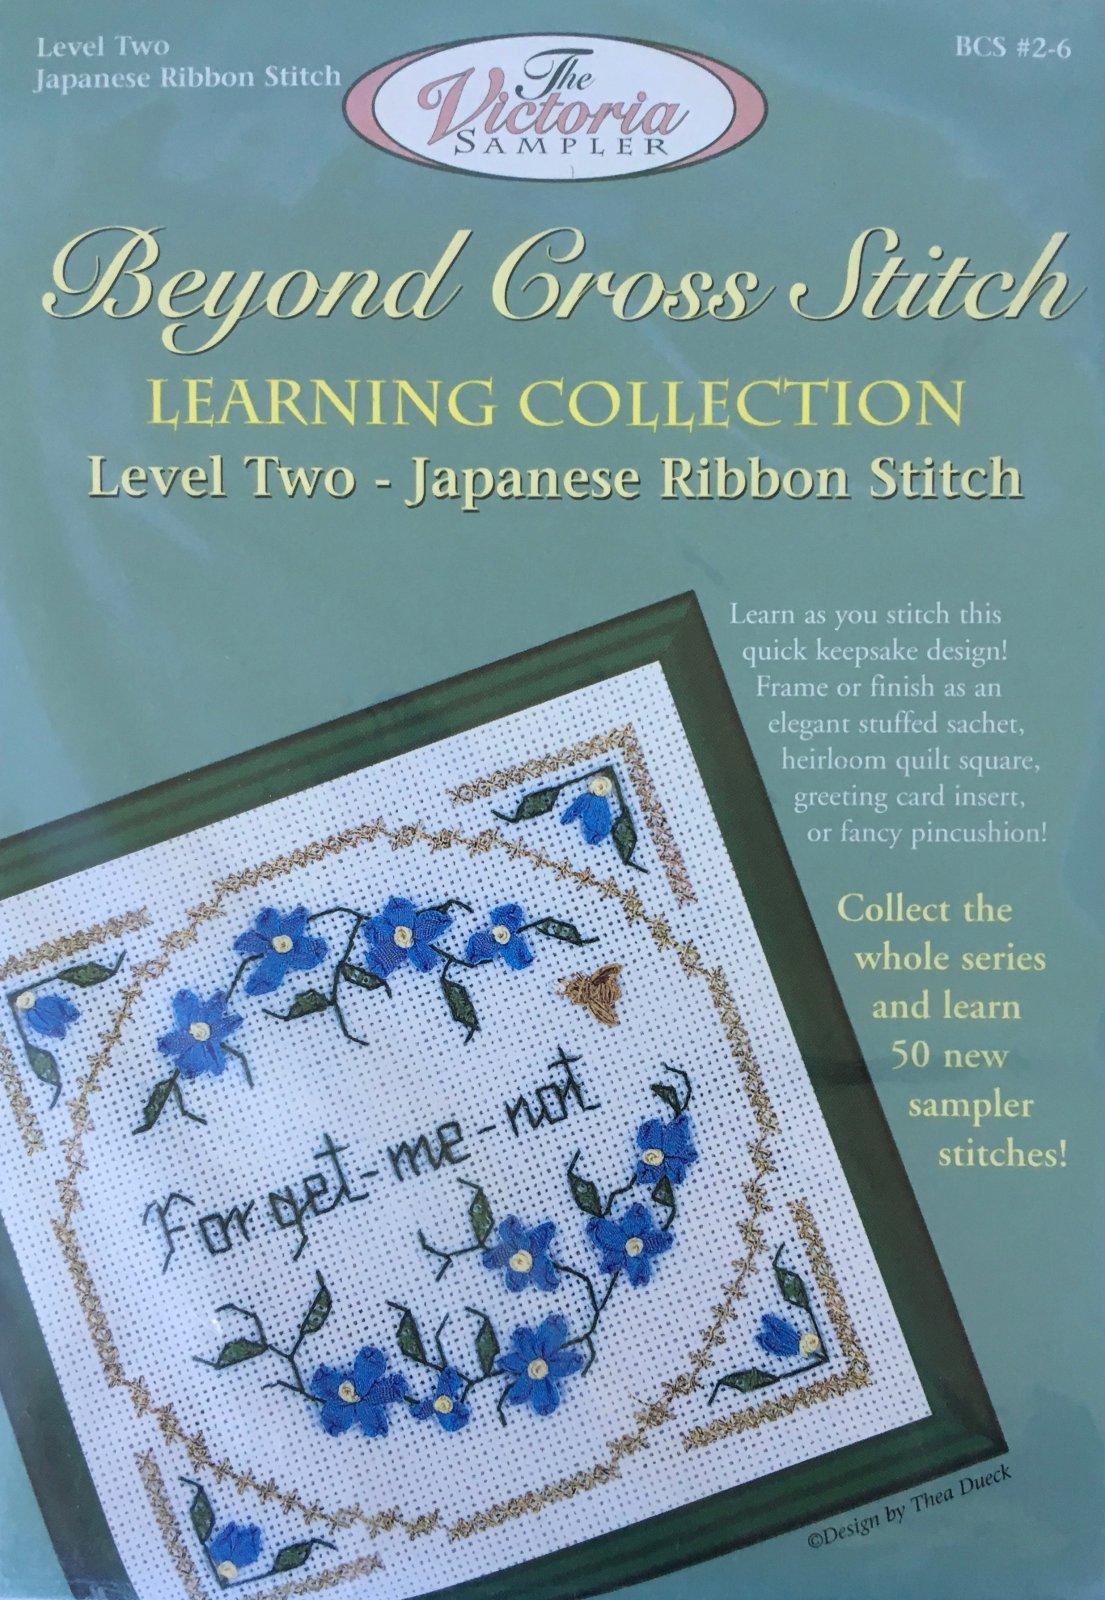 The Victoria Sampler: Forget Me Not Level 2 - #6 Kit; Japanese Ribbon Stitch